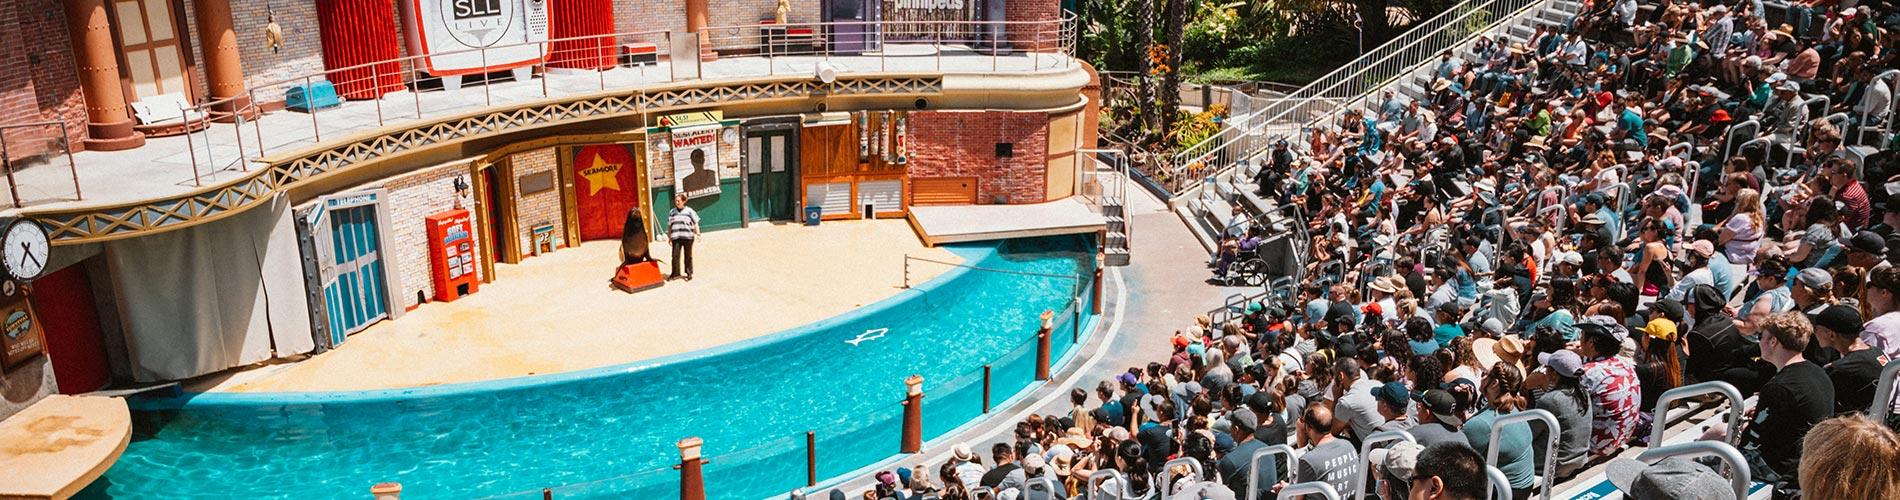 Sea Lion Live at SeaWorld San Diego